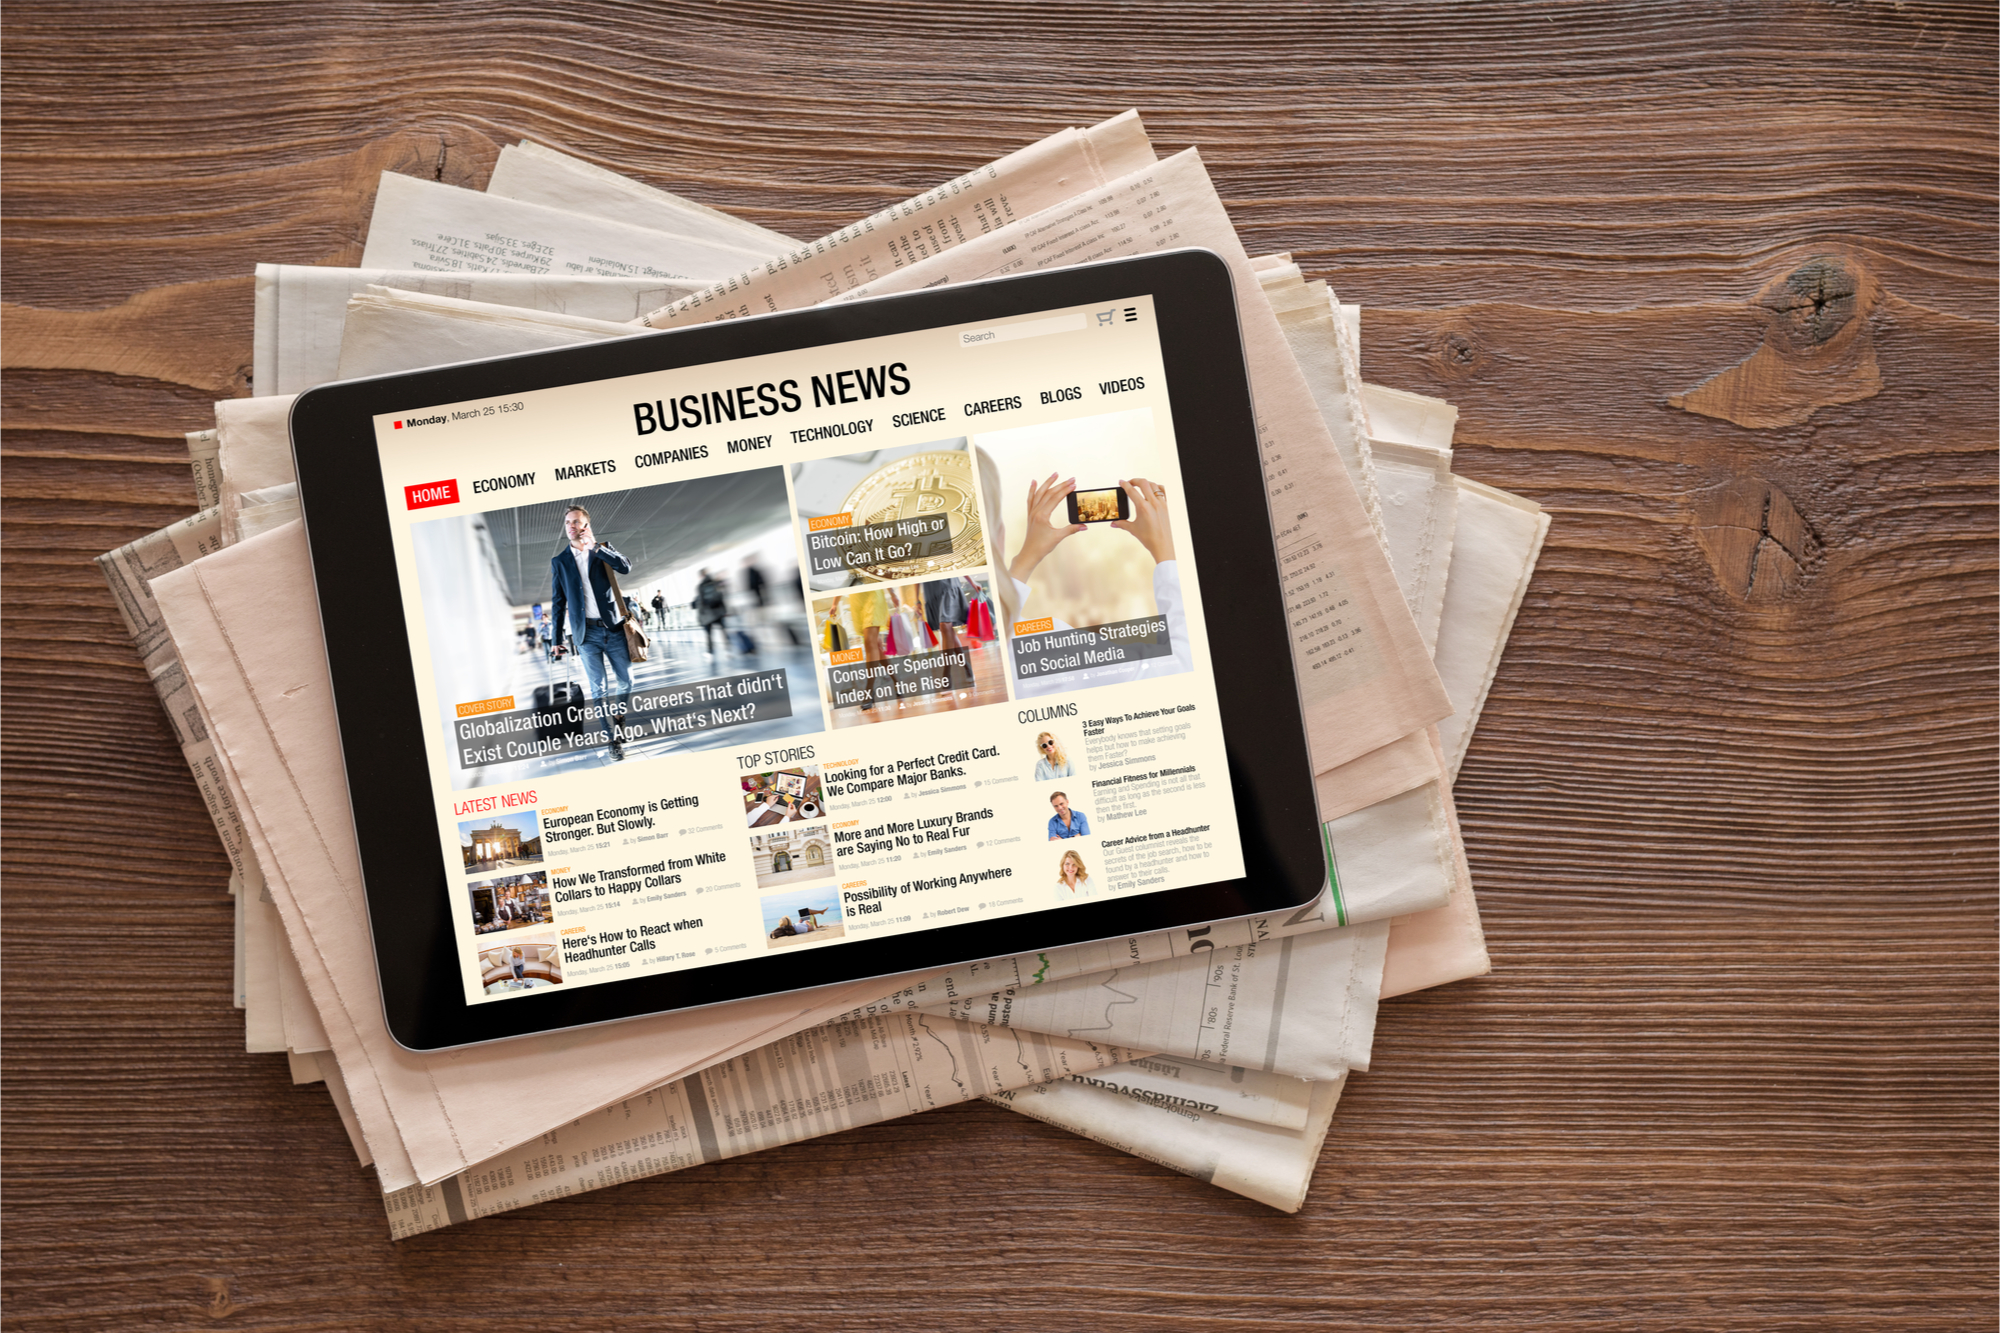 las vegas business news